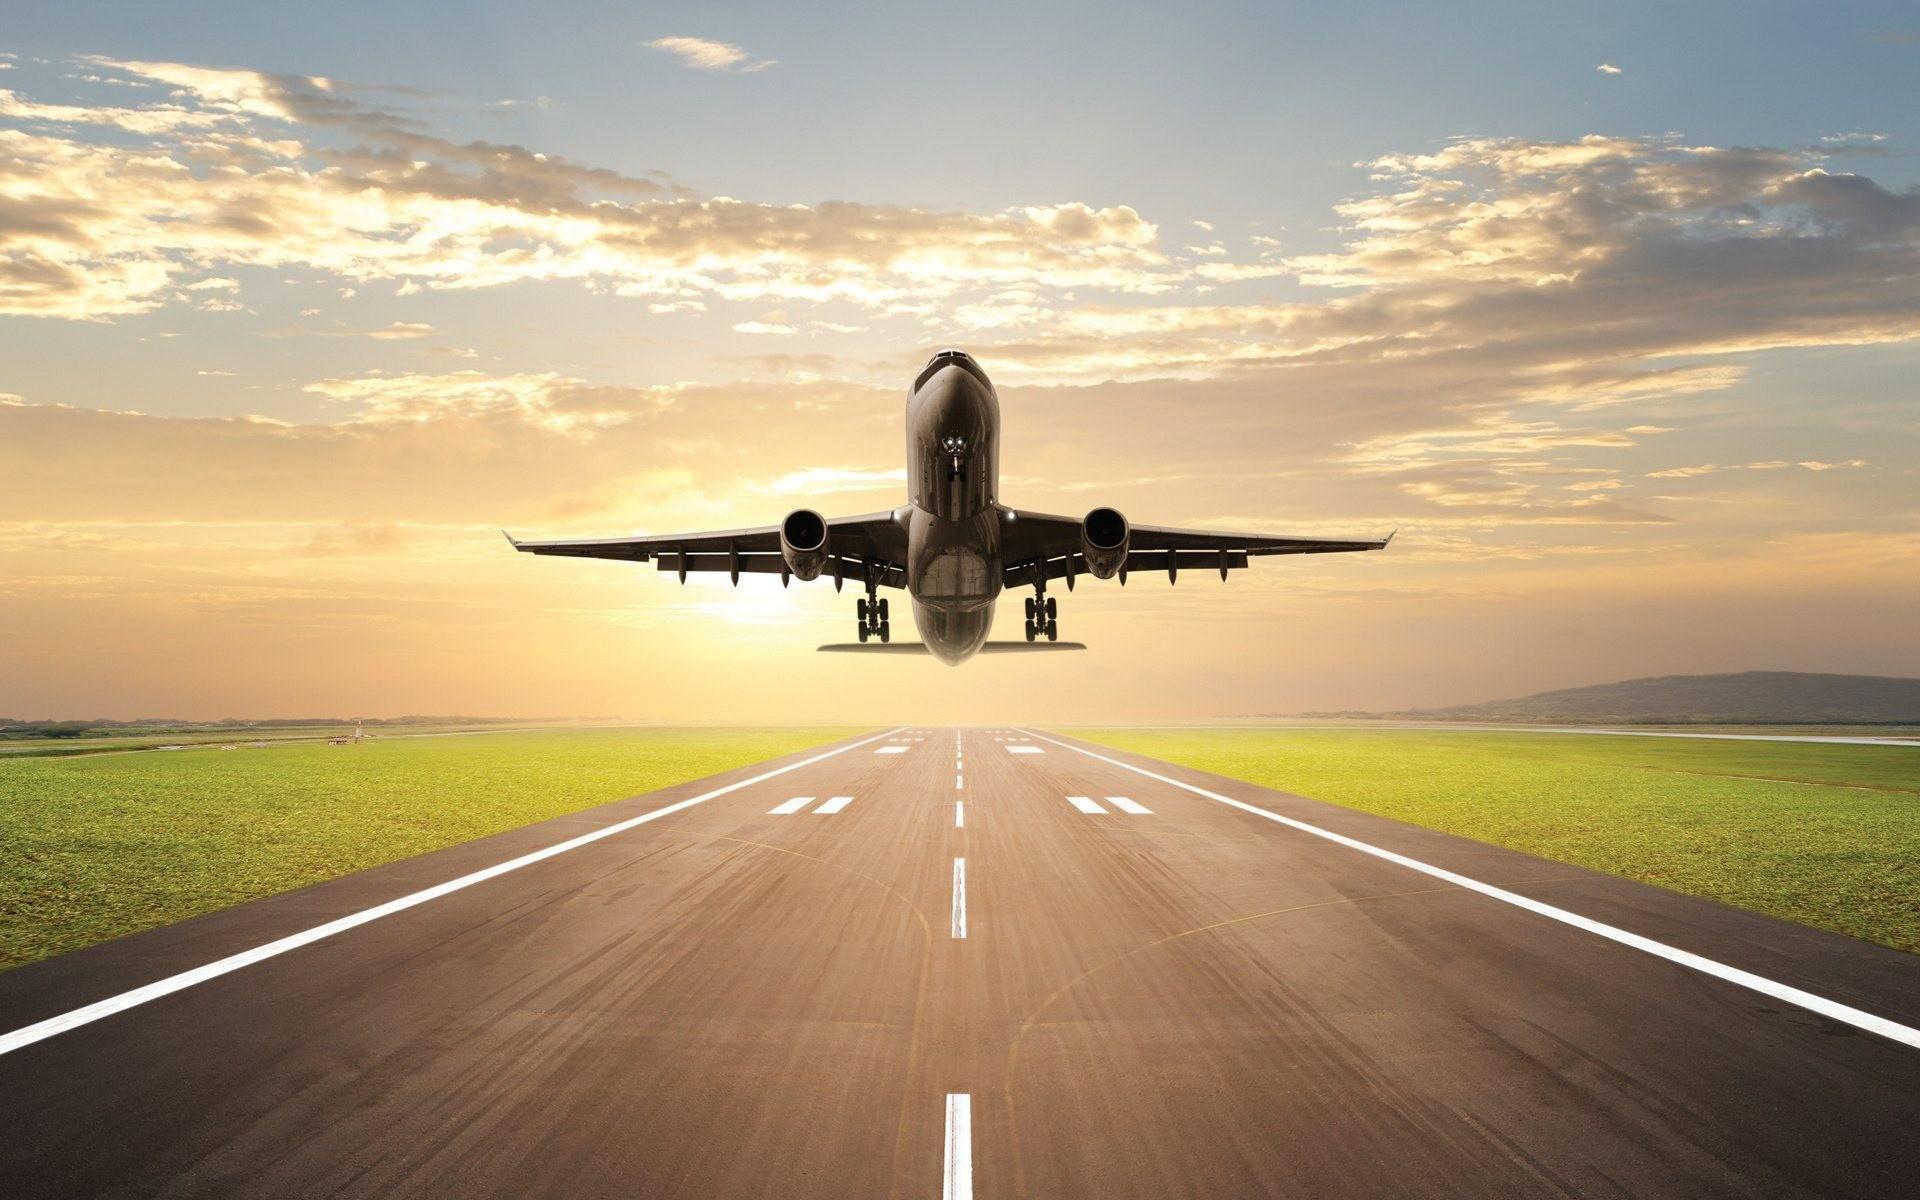 Delhi To Mumbai Flights Fares Aircraft, Senior discounts